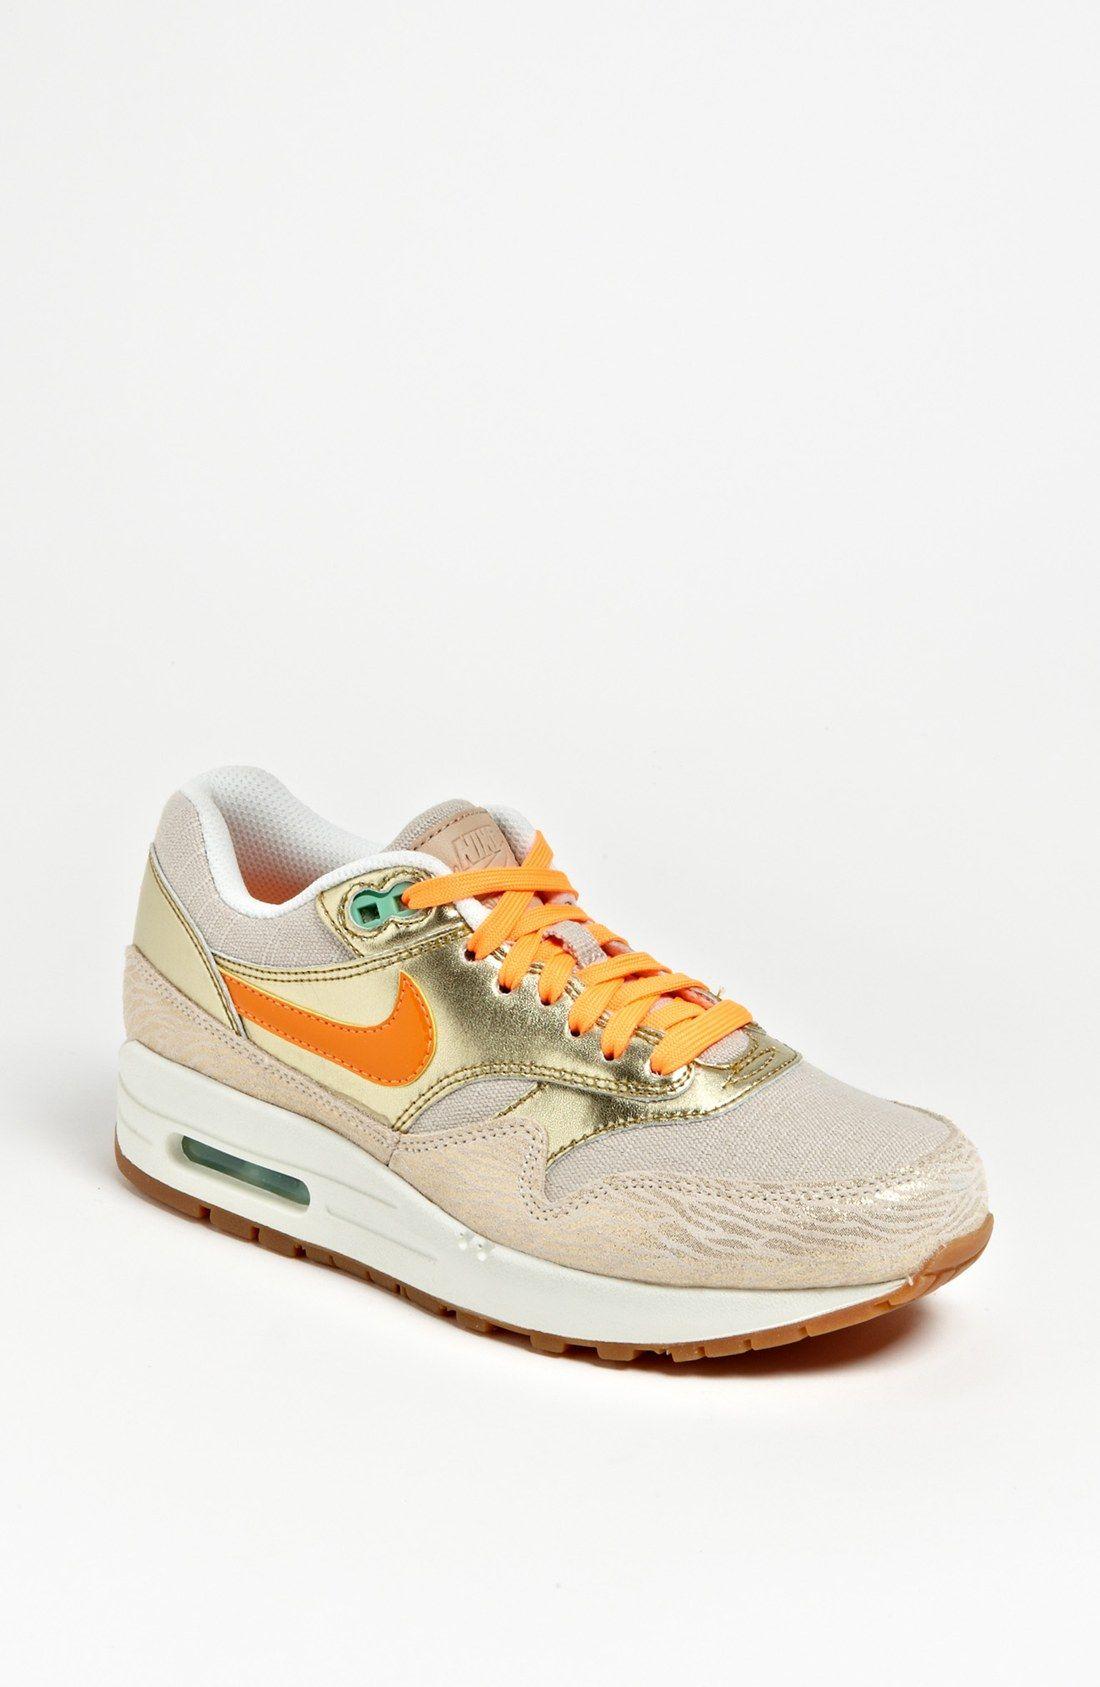 CheapShoesHub com nike free shoes benefits, nike free running shoes  history, nike footscape free qs shoes, nike free xt quick shoes